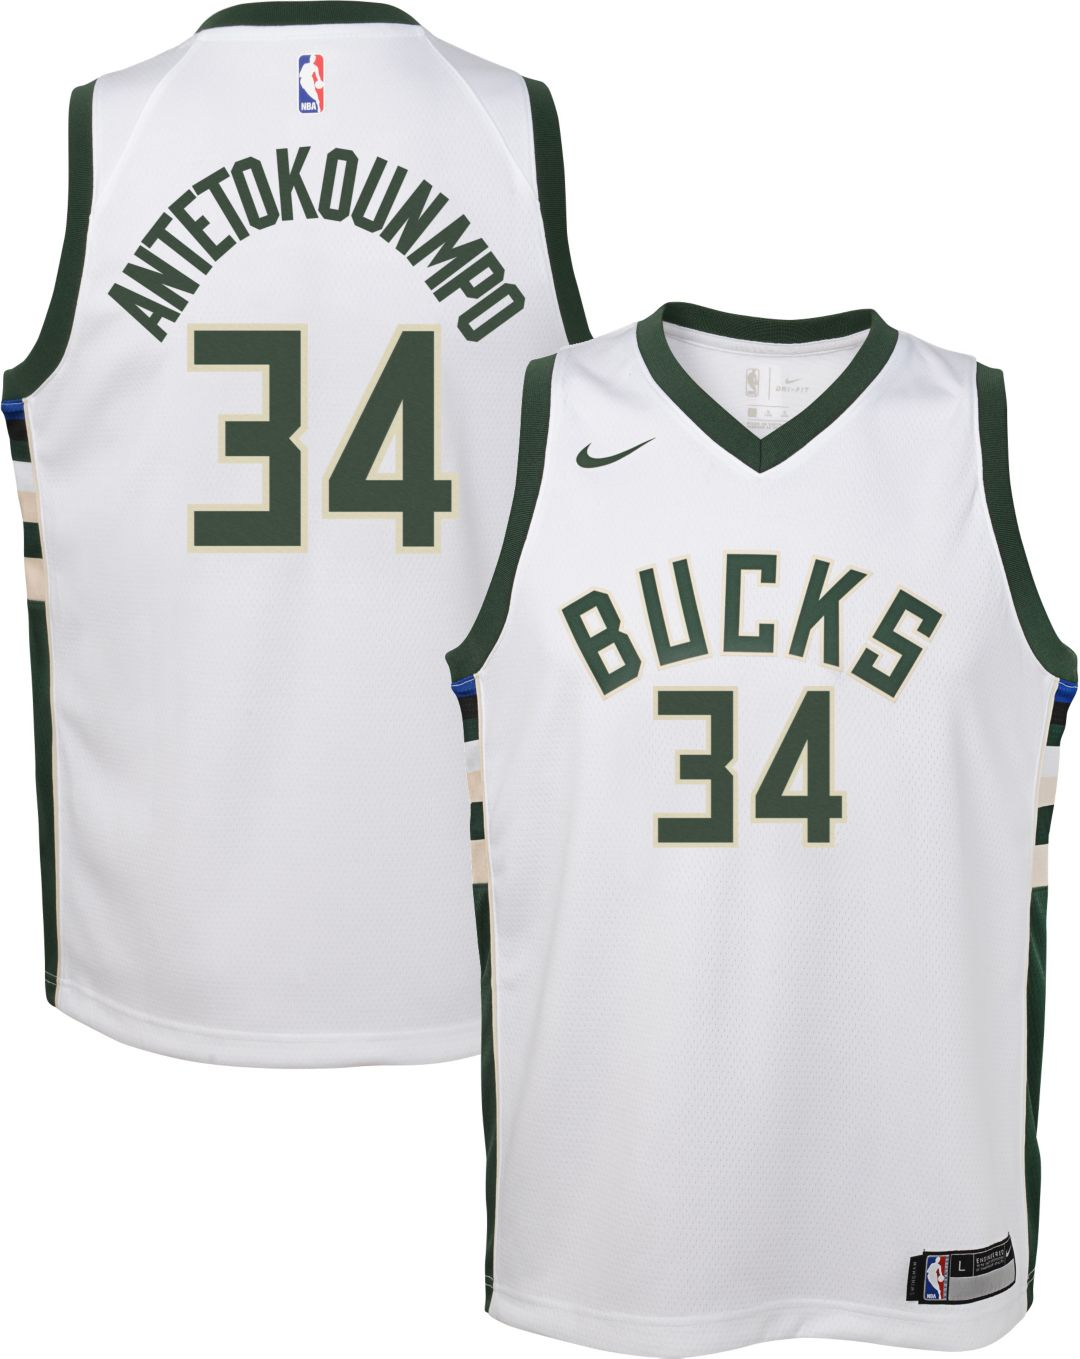 sale retailer d58bf 0ed4d Nike Youth Milwaukee Bucks Giannis Antetokounmpo #34 White Dri-FIT Swingman  Jersey